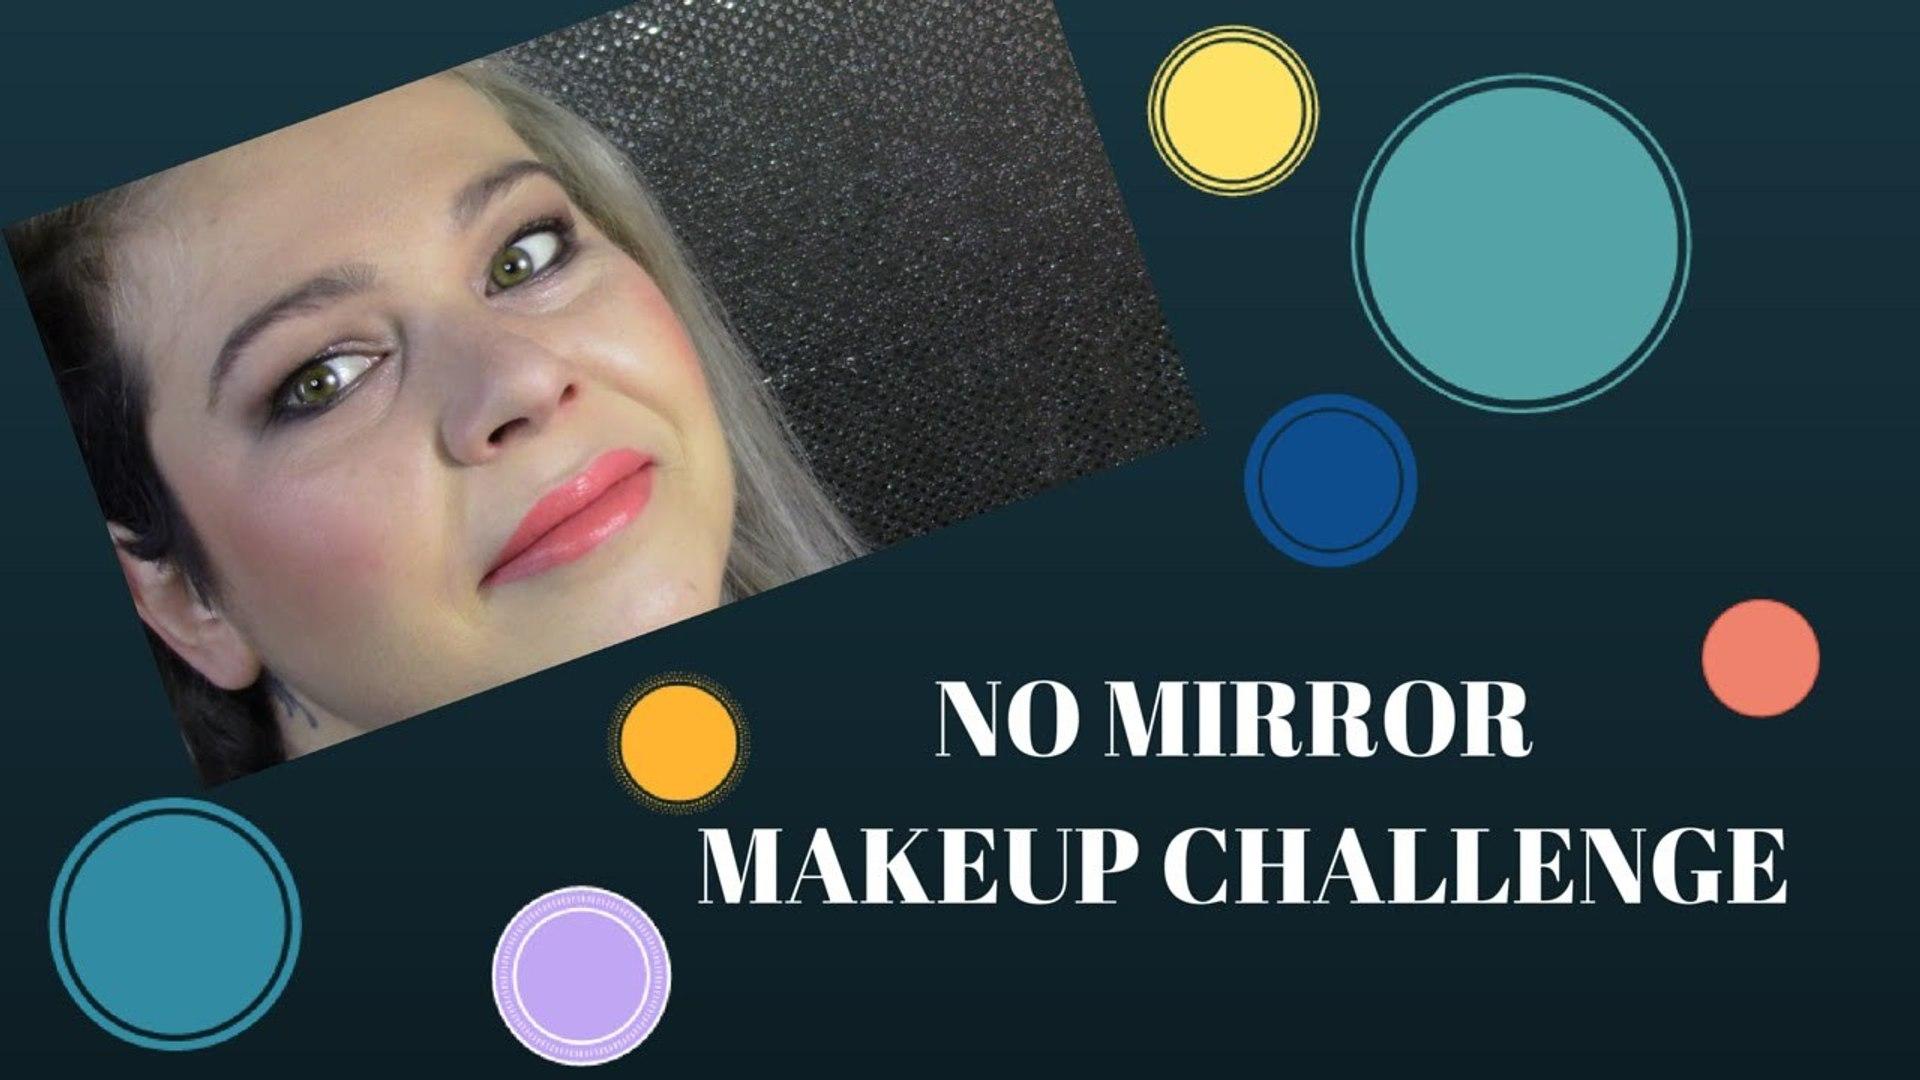 #30giorniconme #6 - NO MIRROR MAKEUP CHALLENGE!